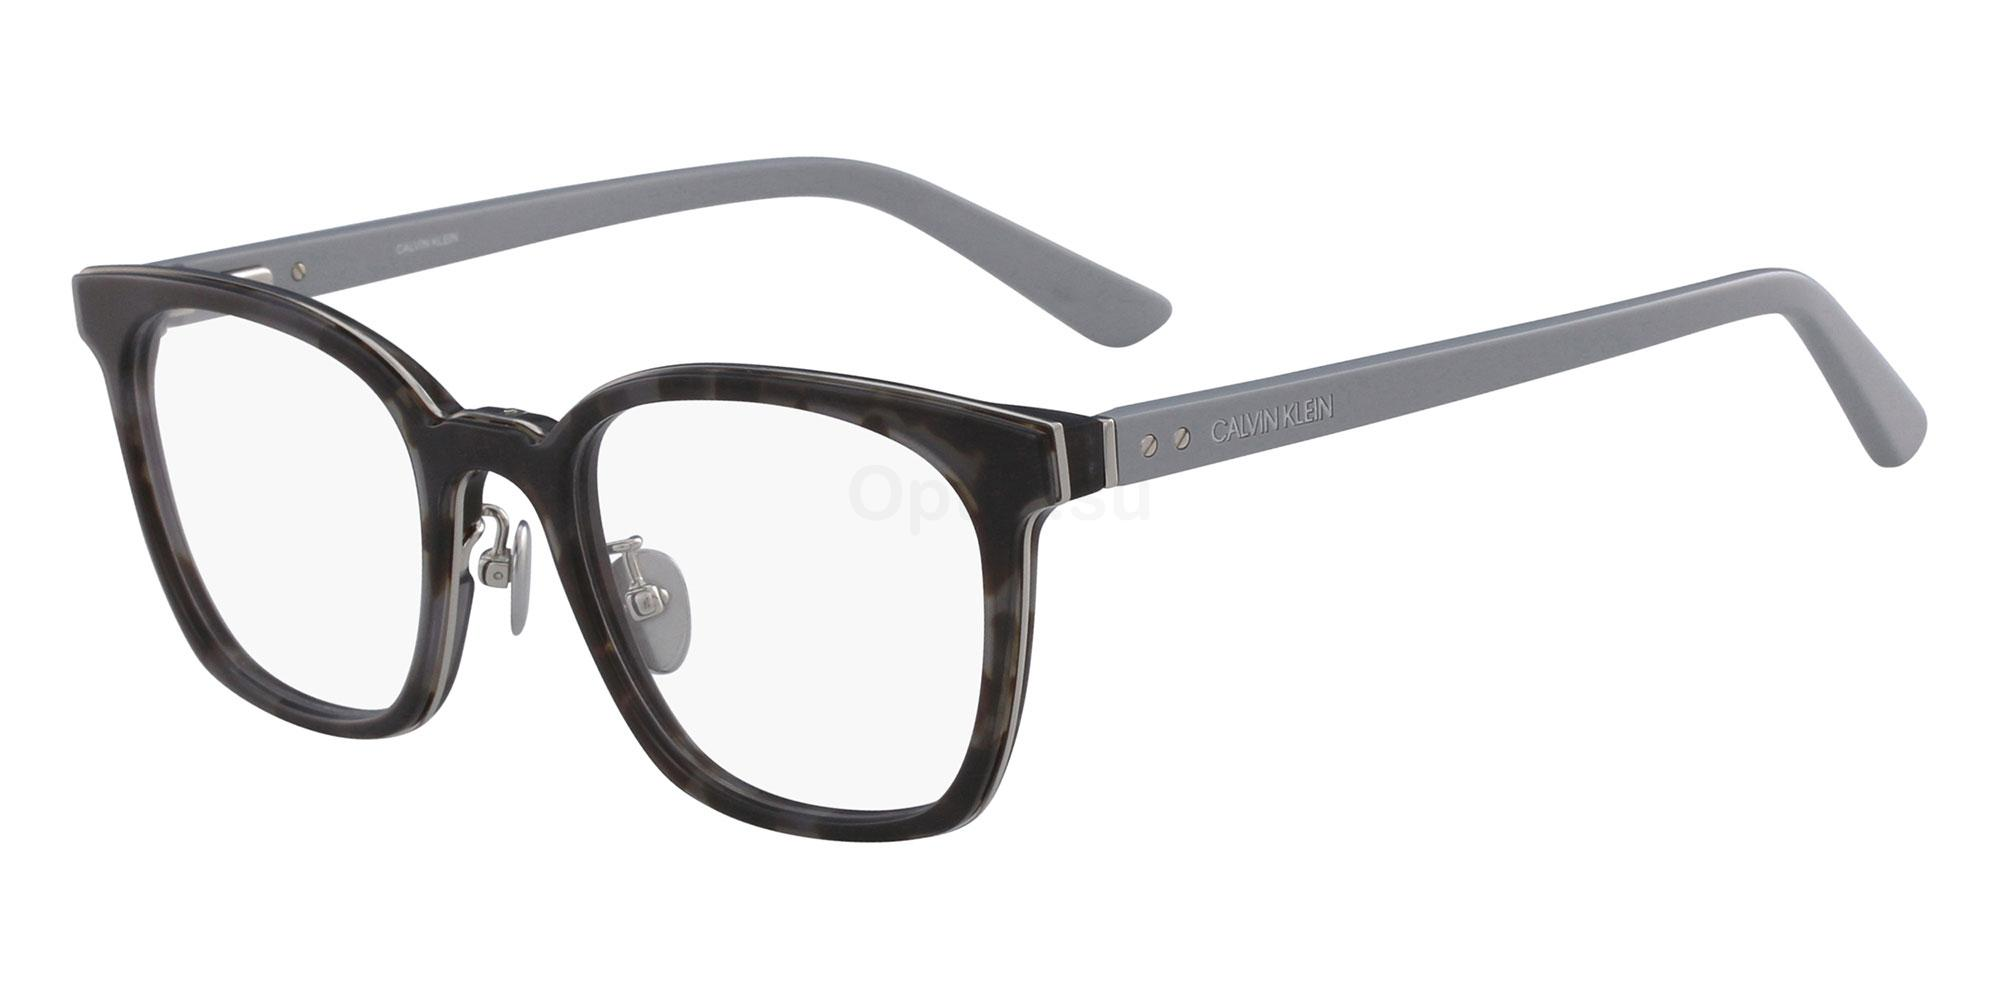 002 CK18512 Glasses, Calvin Klein